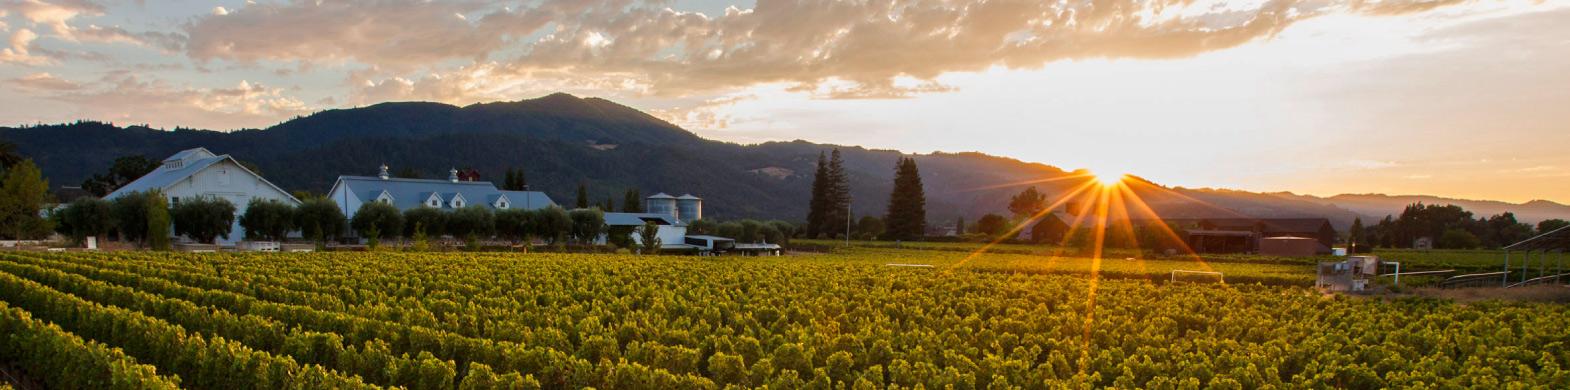 Wine Websites: John C. Sullenger Vineyard